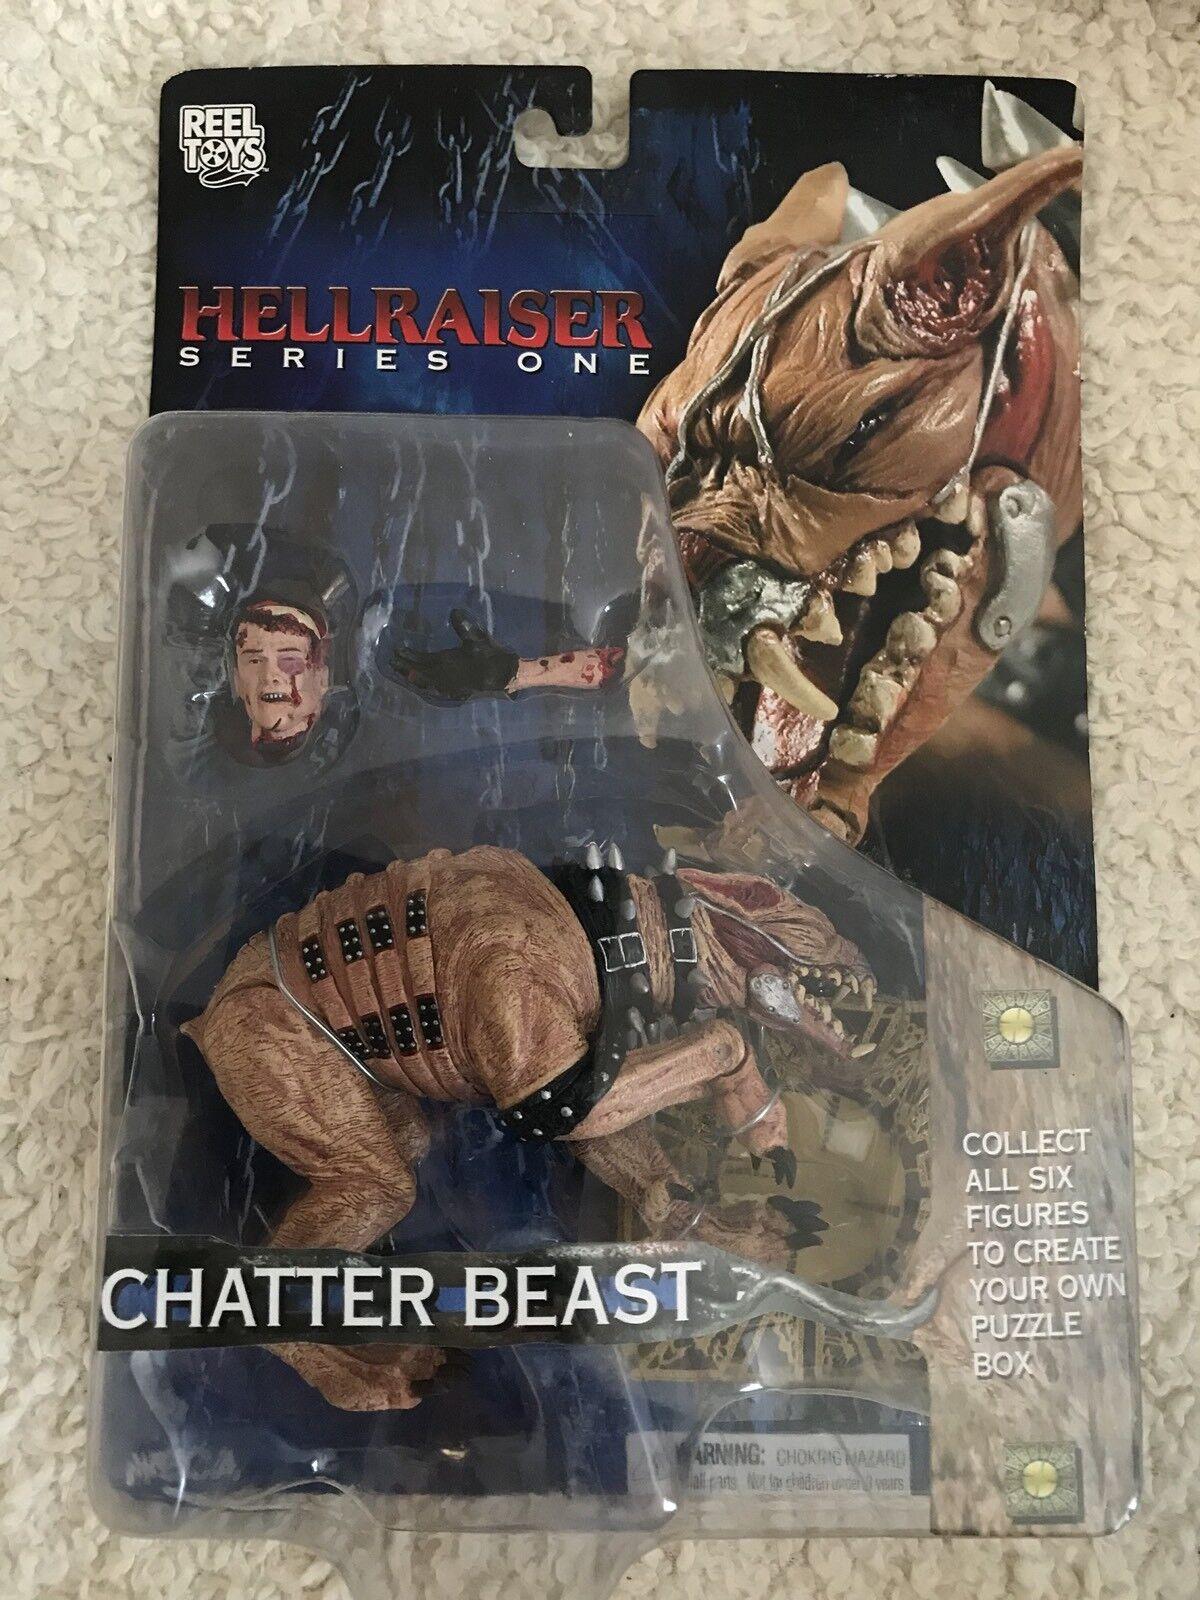 Hellraiser Series 1 NECA Chatter Beast Figure